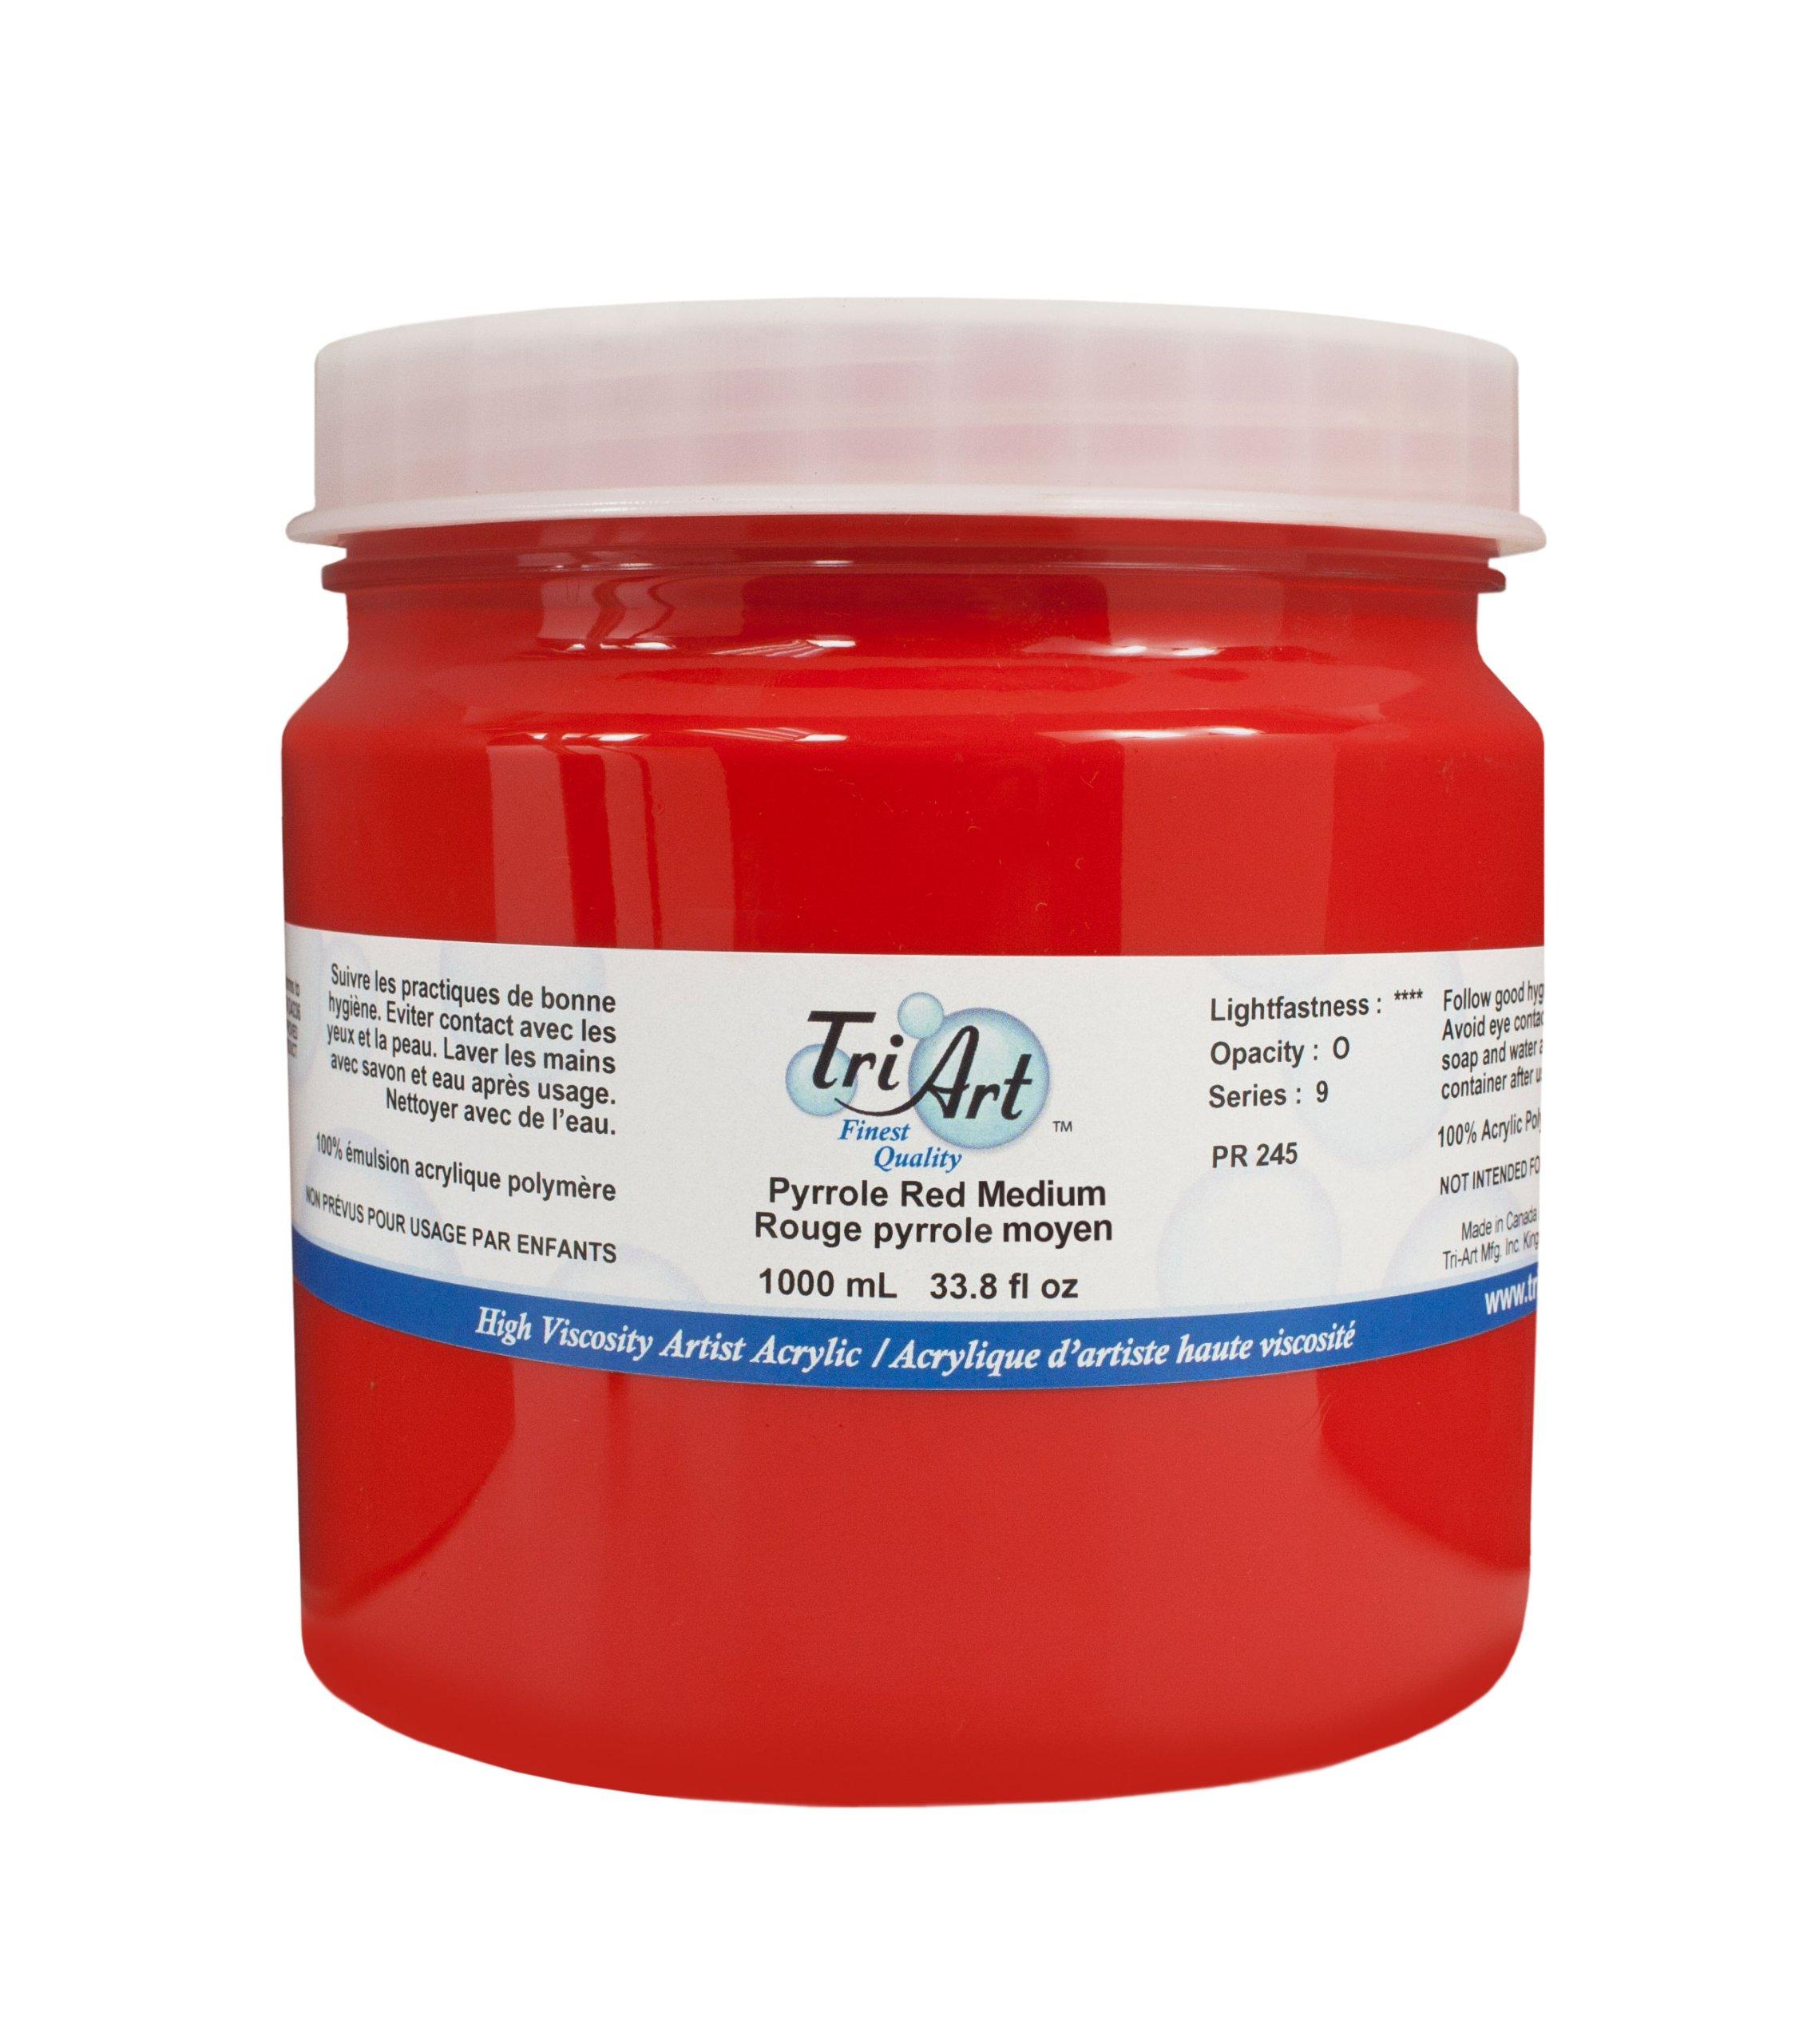 Tri-Art High Viscosity Paint, 1000ml, Medium Pyrrole Red